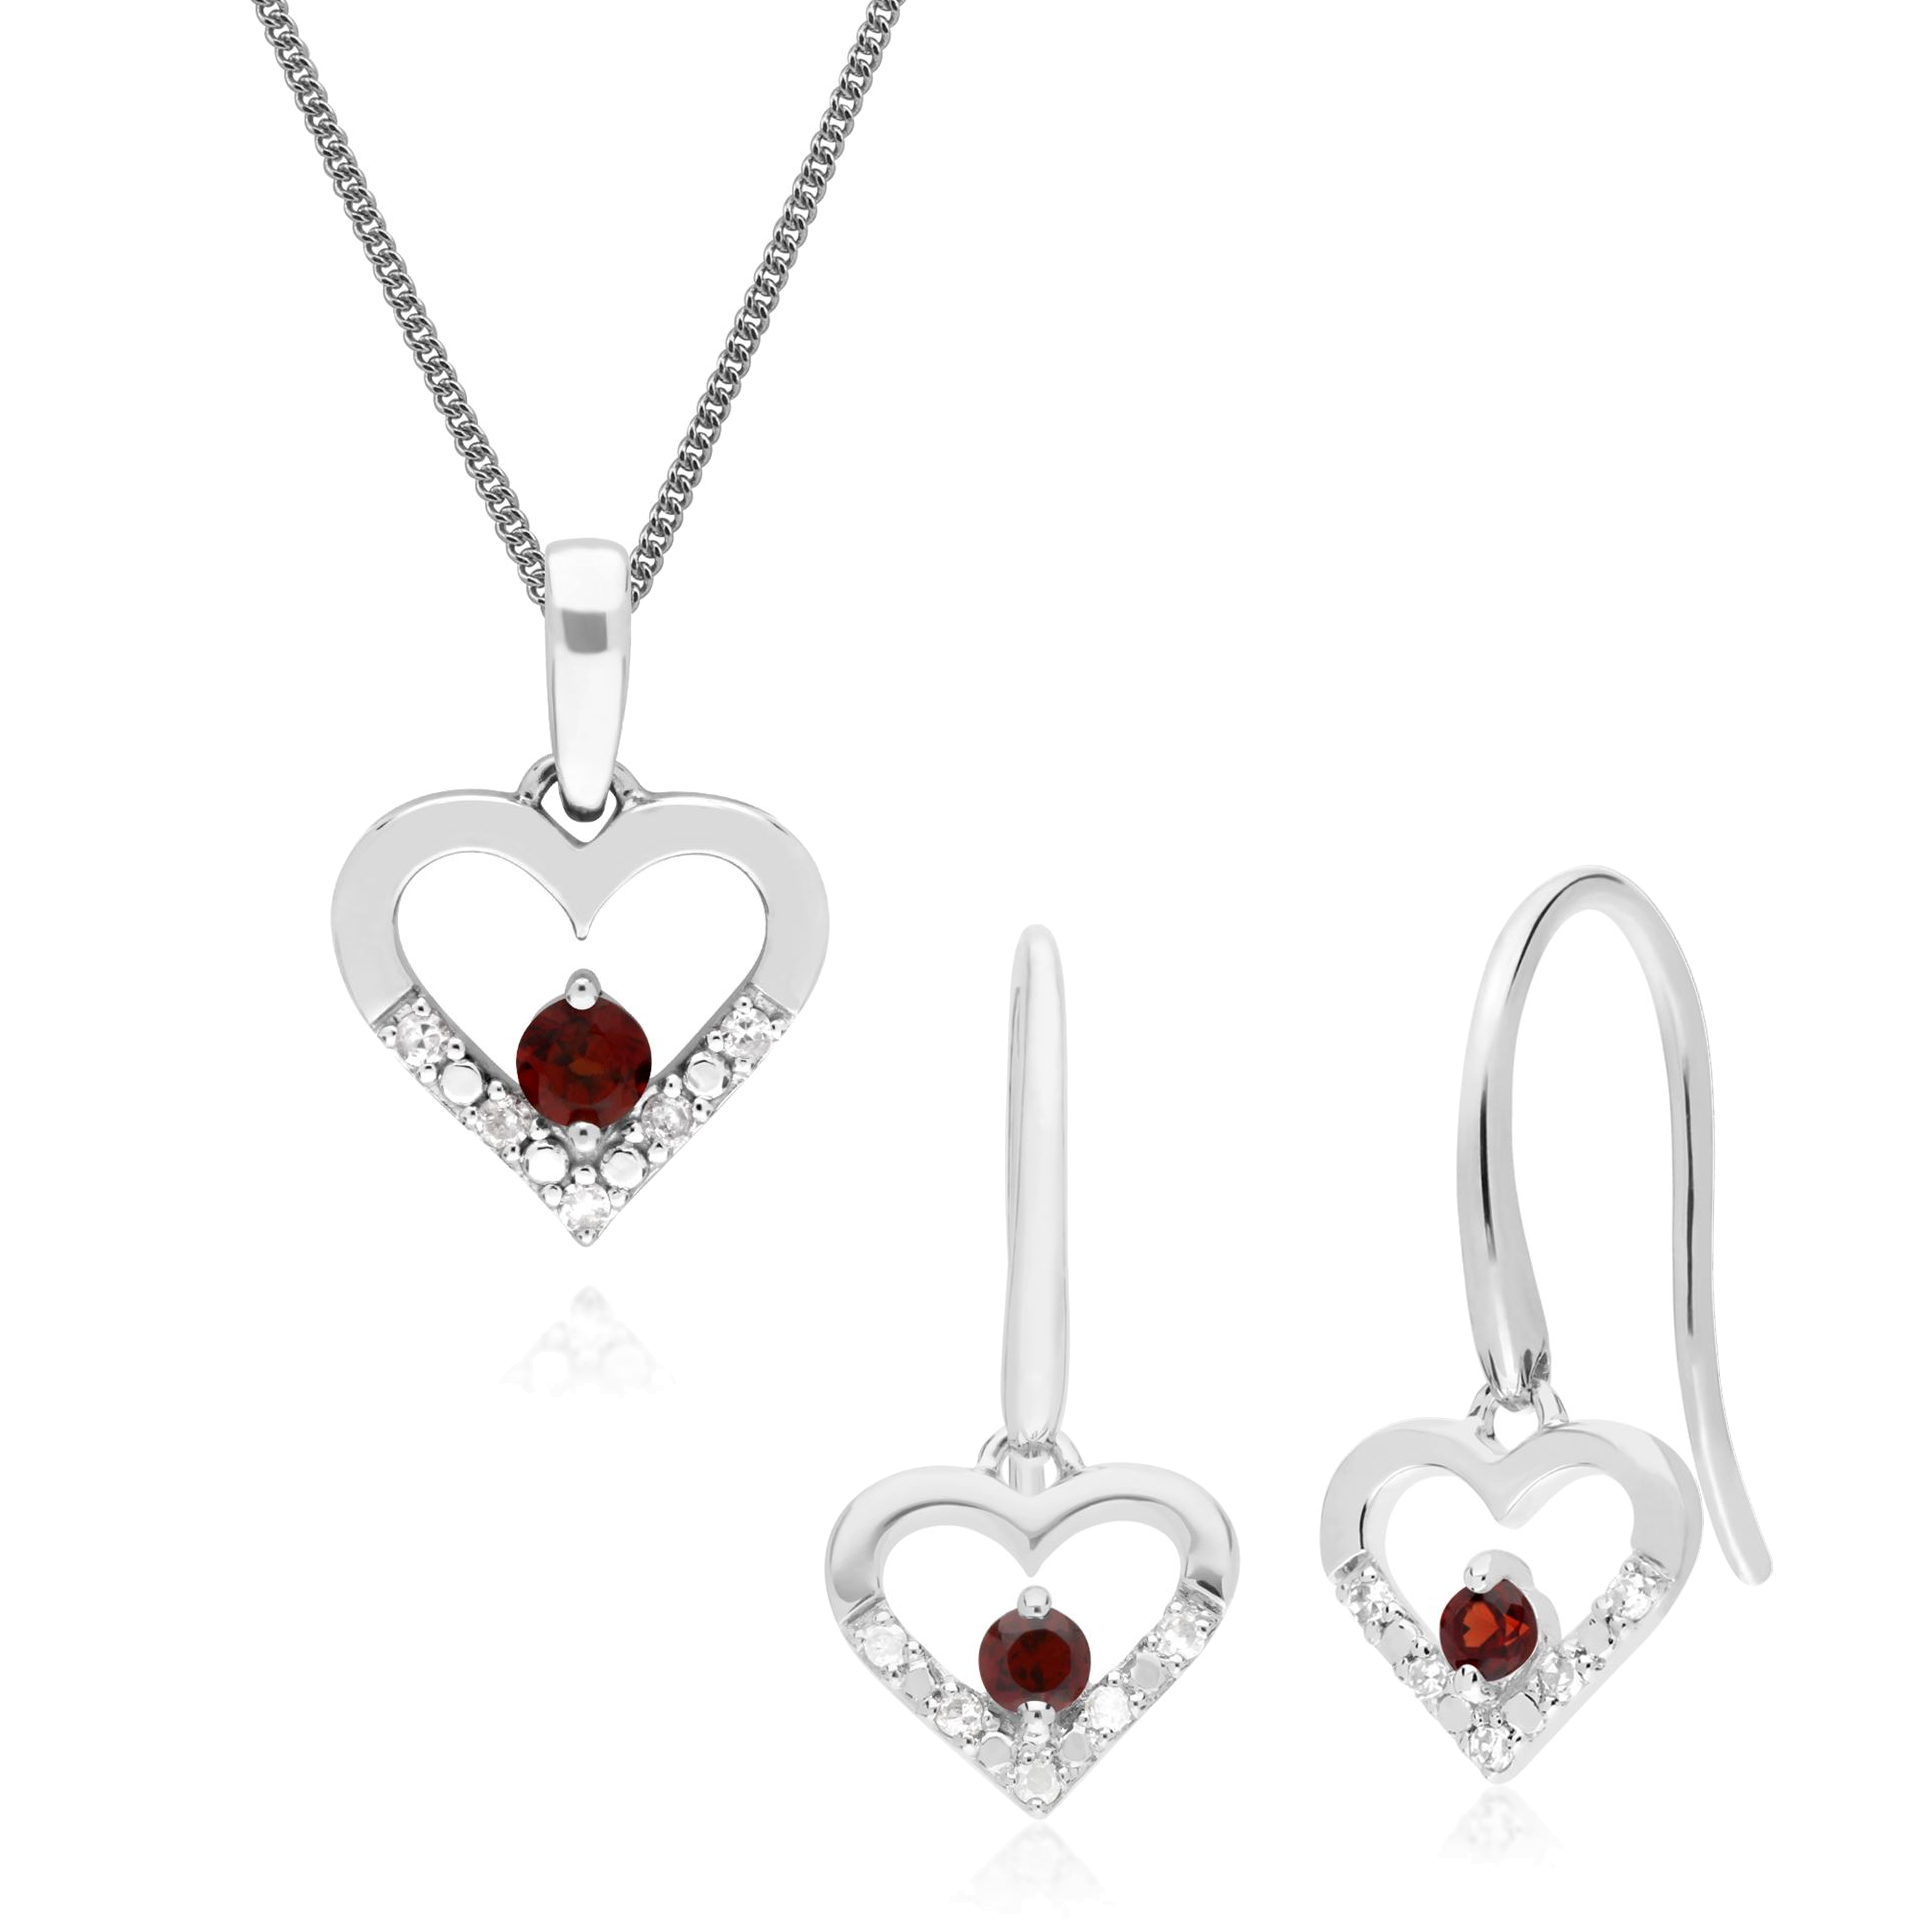 471448b9e Details about 9ct White Gold Garnet & Diamond Heart Drop Earrings & 45cm  Necklace Set